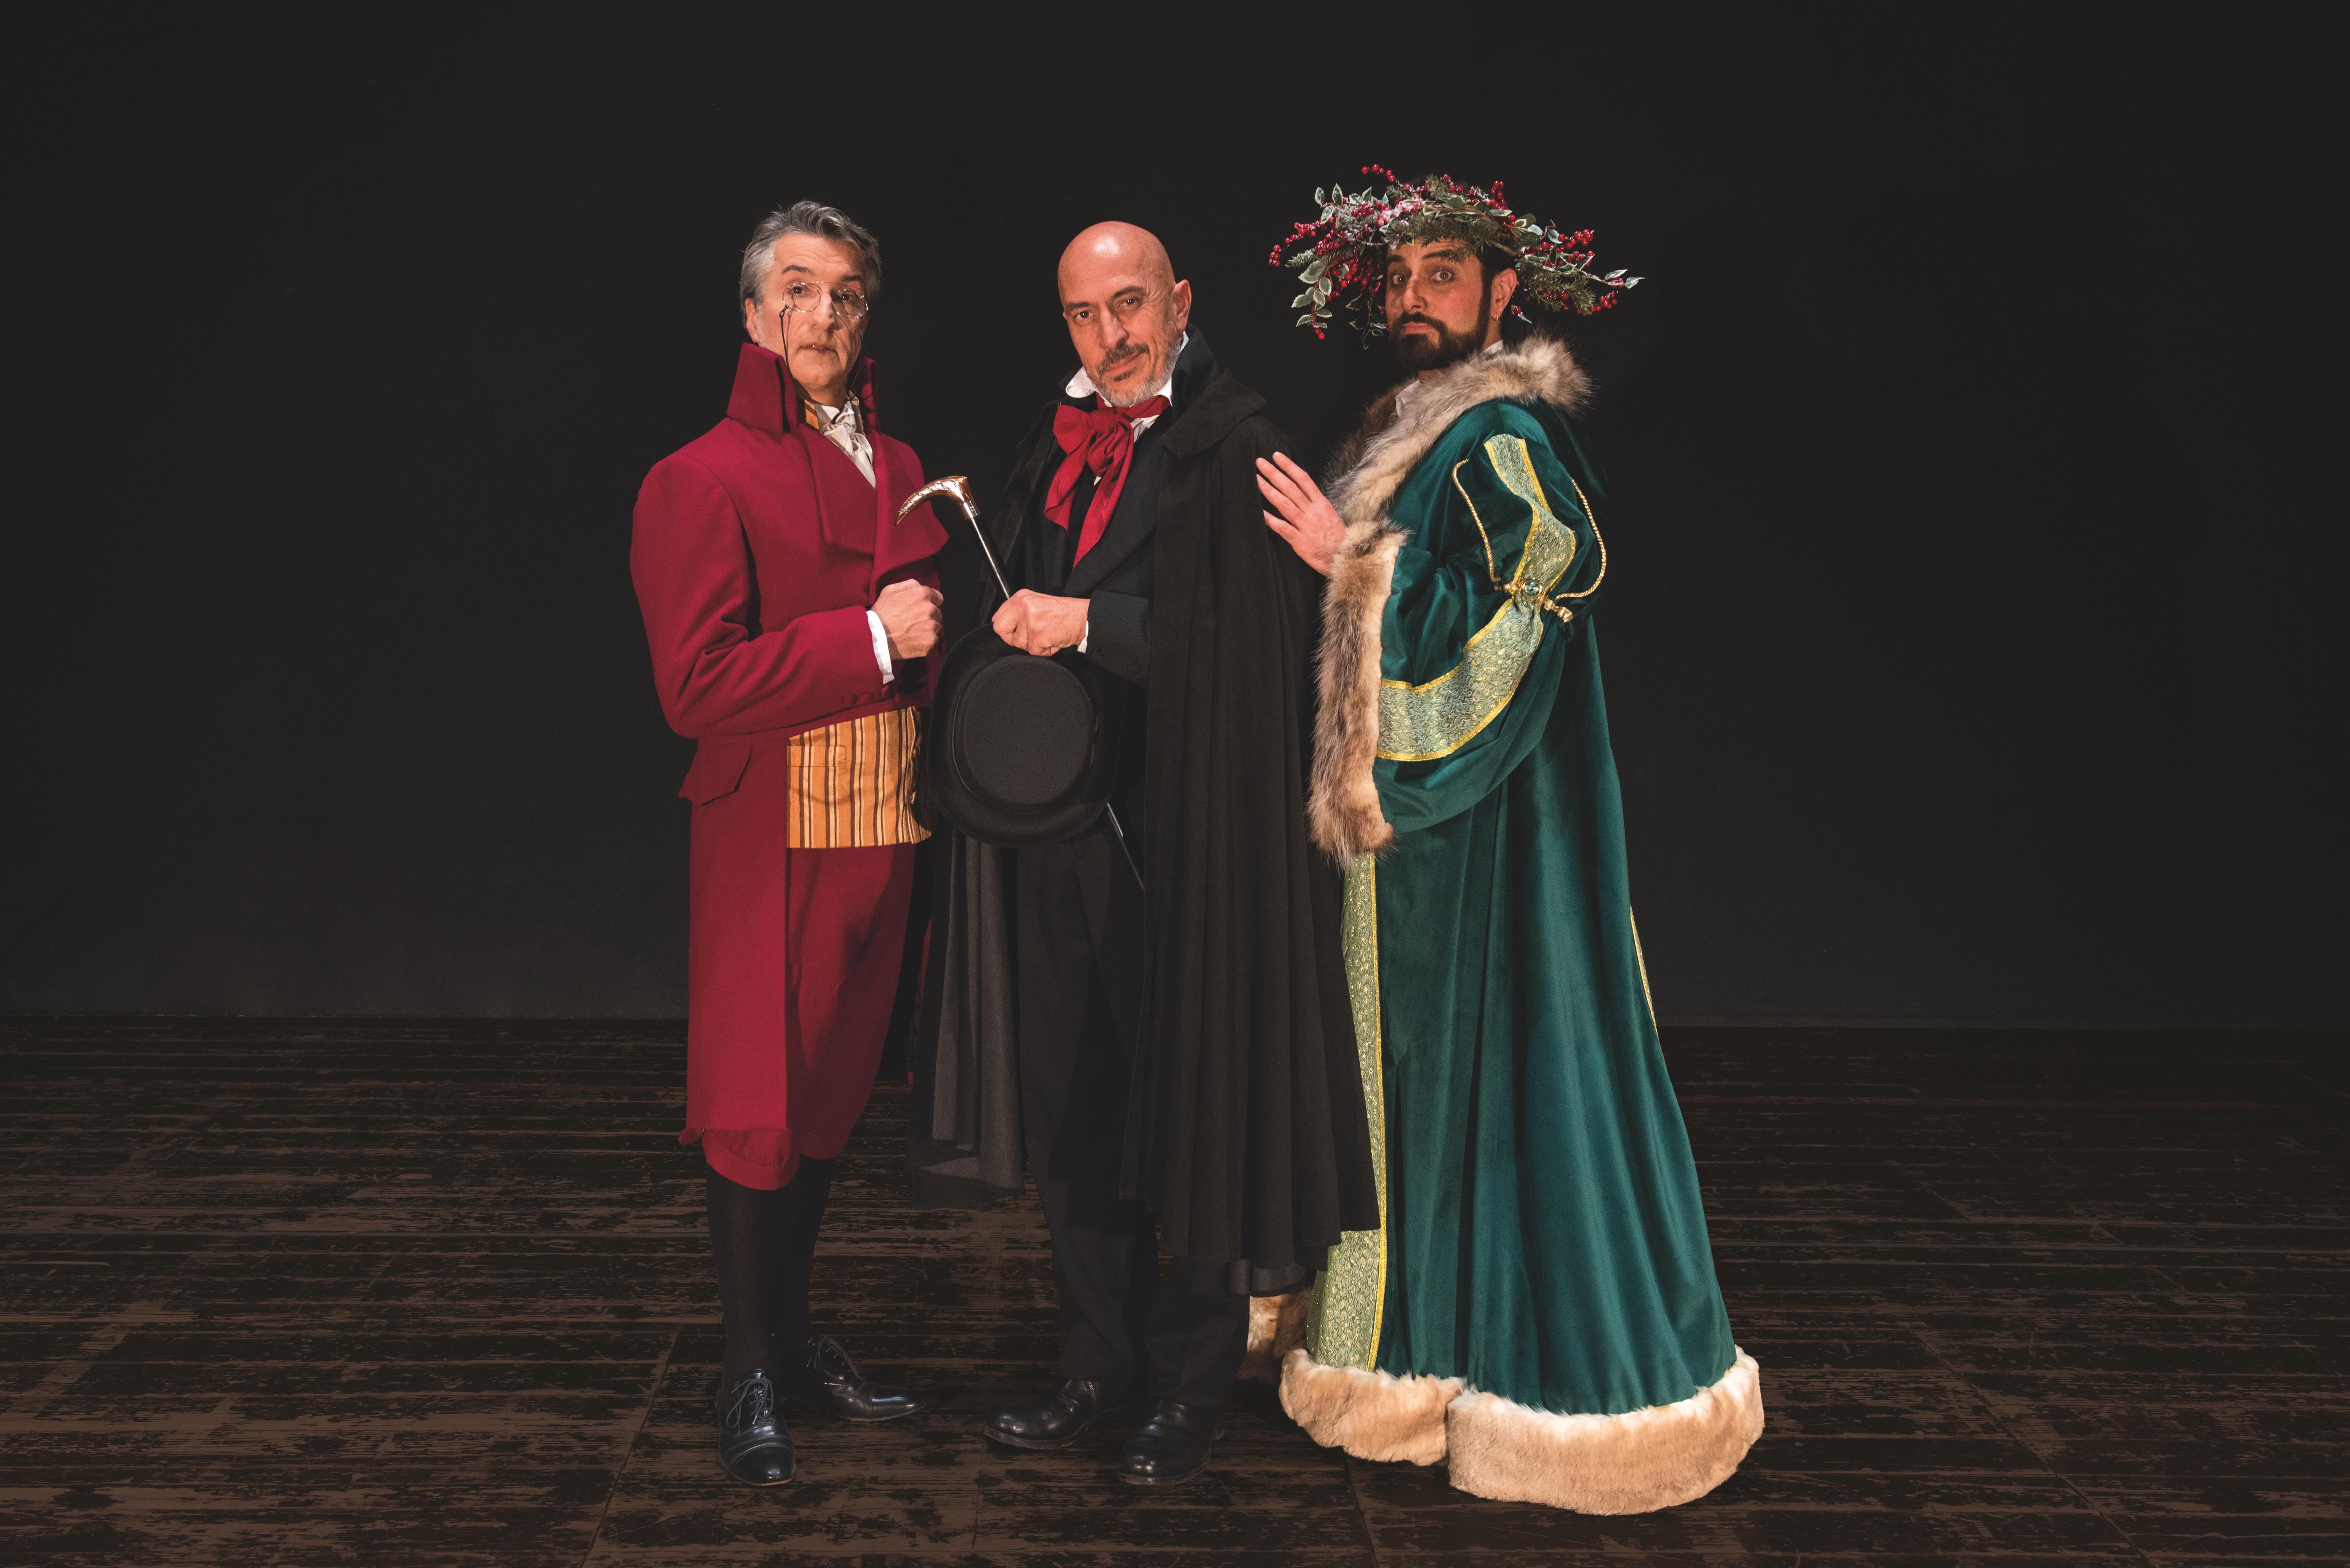 A Christmas Carol musical - Angelini, Ciufoli, de Guglielmo